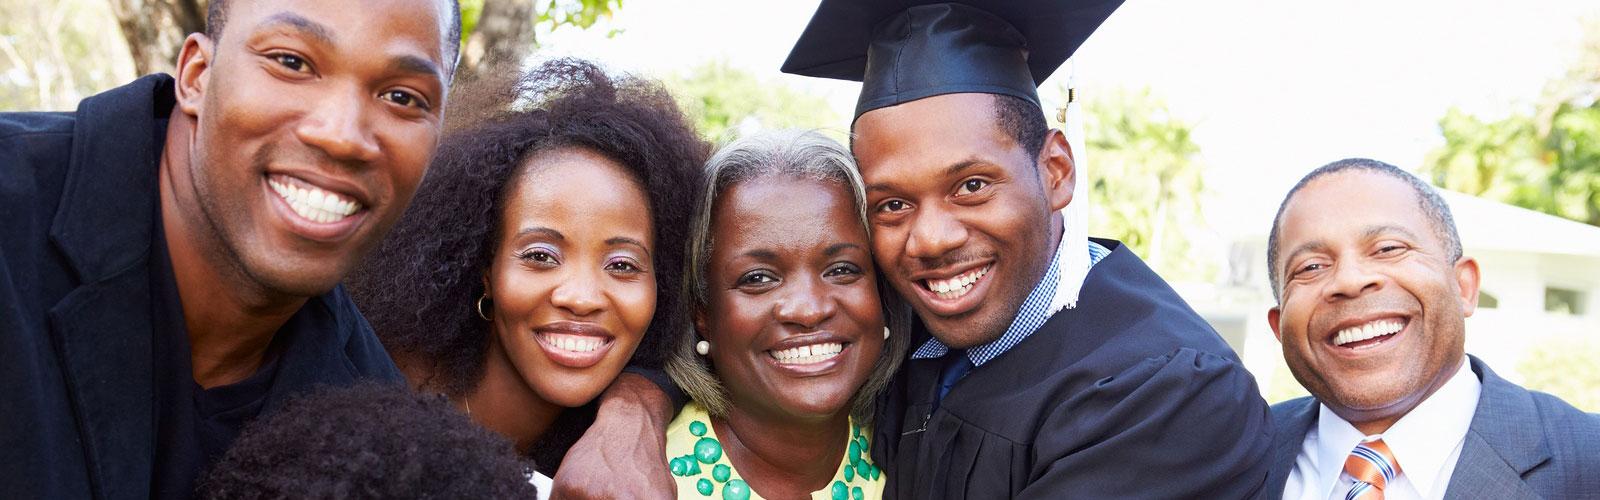 Family_Graduation_bg1